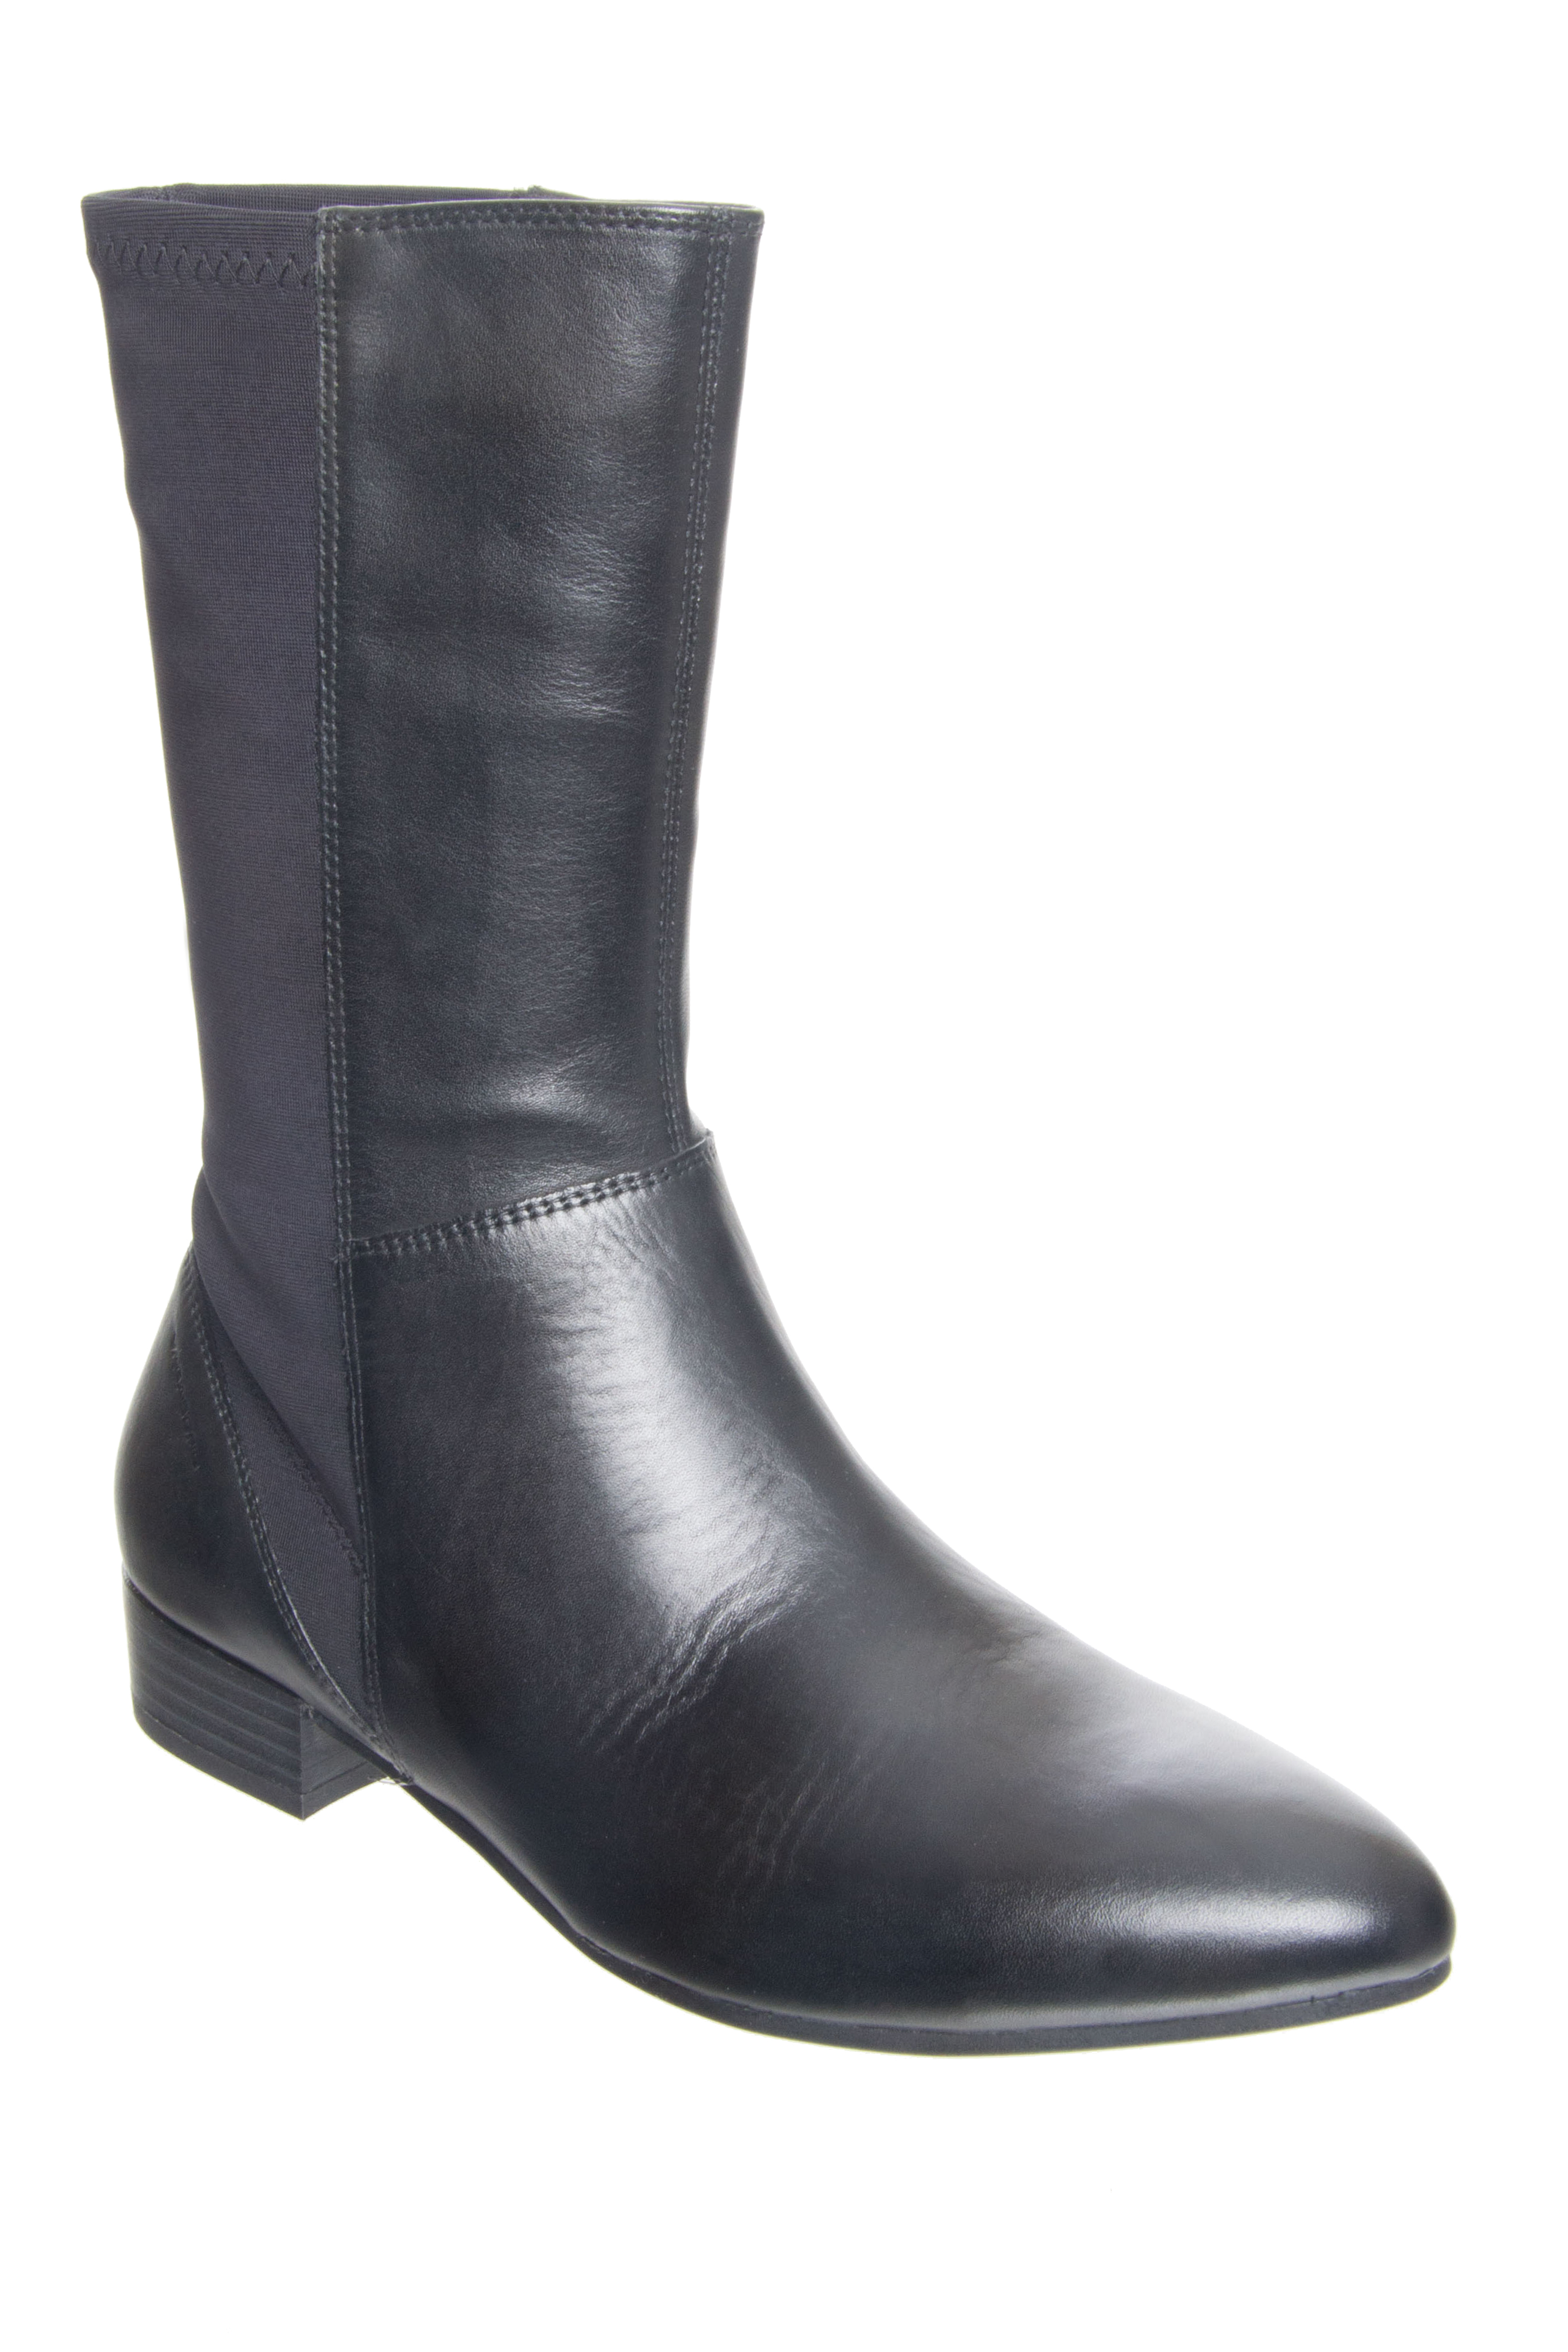 Vagabond Gigi Low Heel Boots - Black